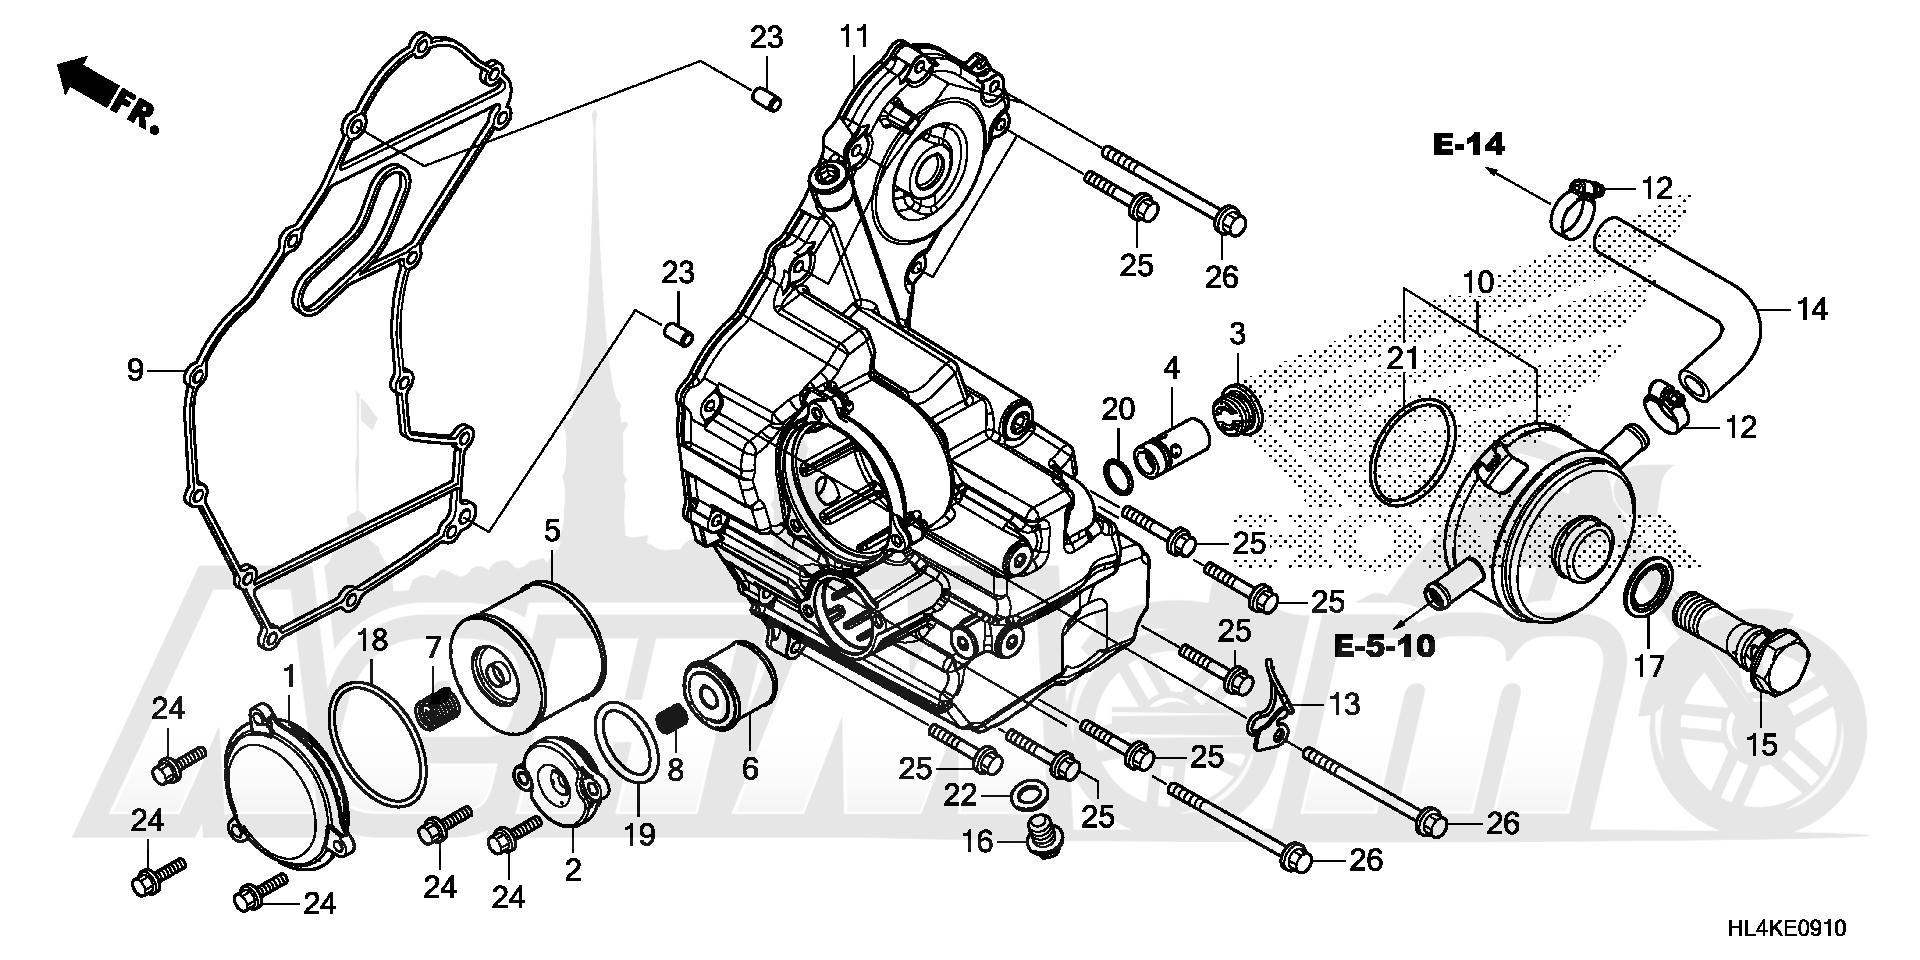 Запчасти для Квадроцикла Honda 2019 SXS1000M5L Раздел: OIL COOLER | маслянный радиатор